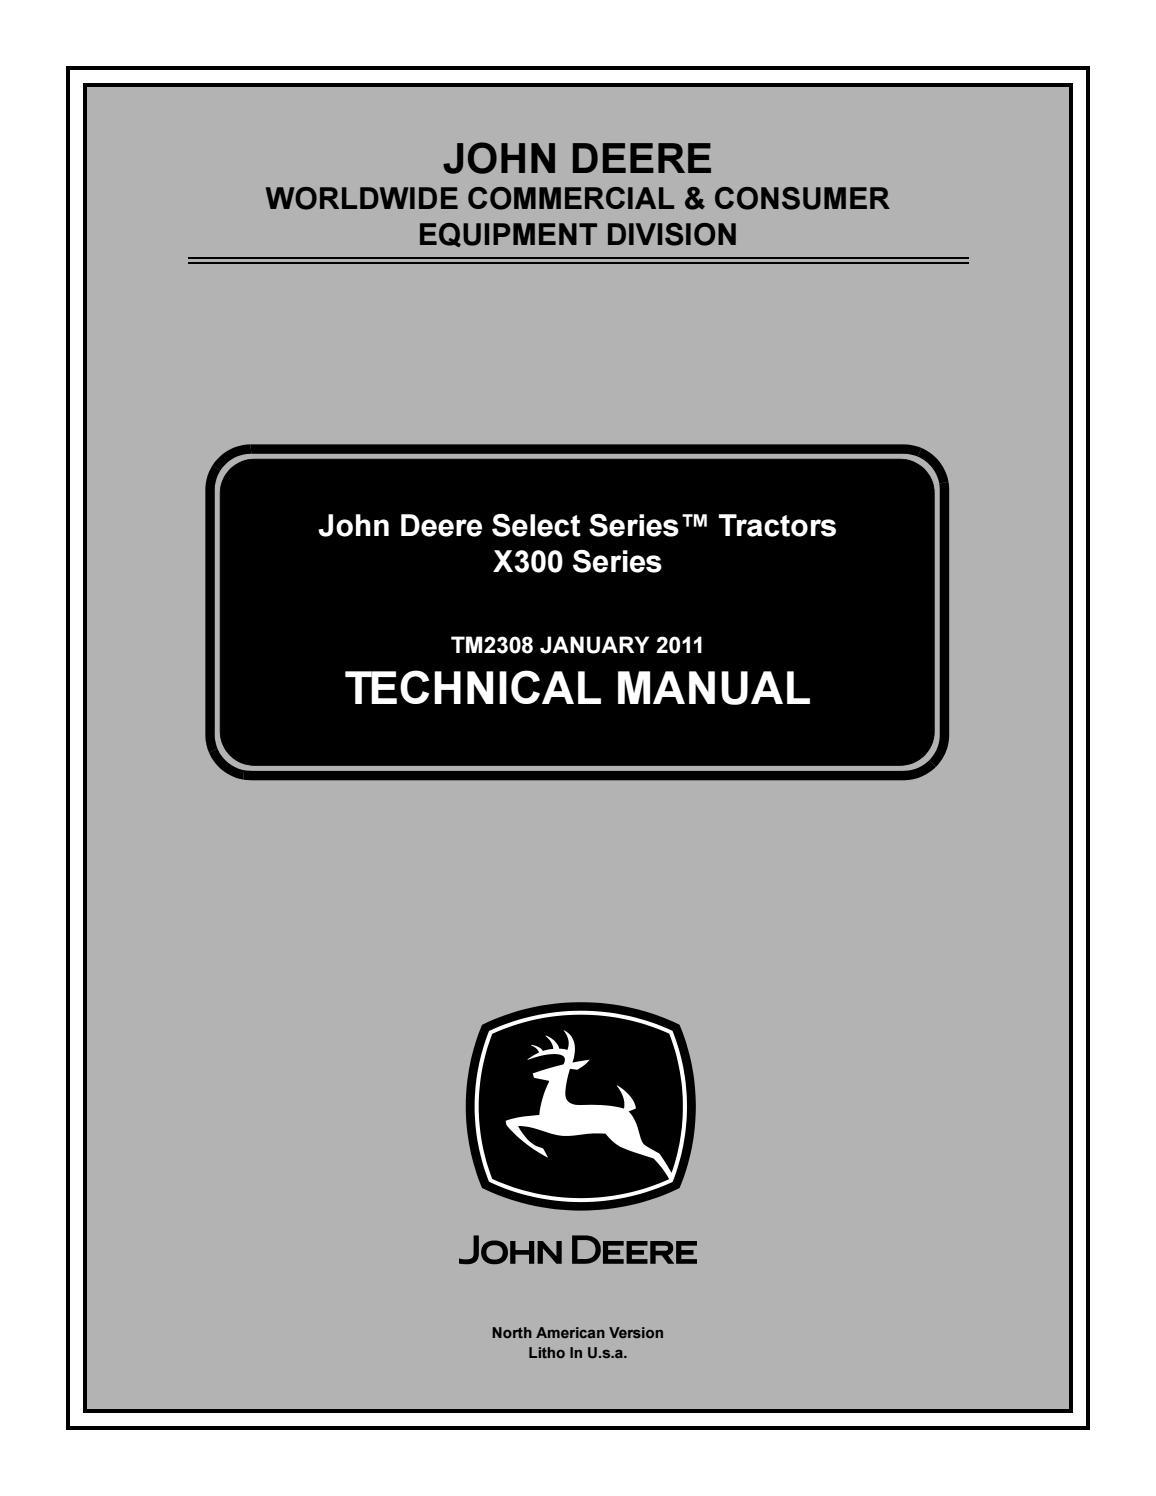 John deere x324 lawn tractor service repair manual by ... on john deere gx335 wiring diagram, john deere x500 wiring diagram, john deere lx279 wiring diagram, john deere z445 wiring diagram, john deere srx75 wiring diagram, john deere x495 wiring diagram, john deere x304 wiring diagram, john deere lt180 wiring diagram, john deere x475 wiring diagram, john deere x534 wiring diagram, john deere x360 wiring diagram, john deere x595 wiring diagram, john deere la115 wiring diagram, john deere x720 wiring diagram, john deere lx280 wiring diagram, john deere z830a wiring diagram, john deere x740 wiring diagram, john deere gx345 wiring diagram, john deere z425 wiring diagram, john deere lx173 wiring diagram,